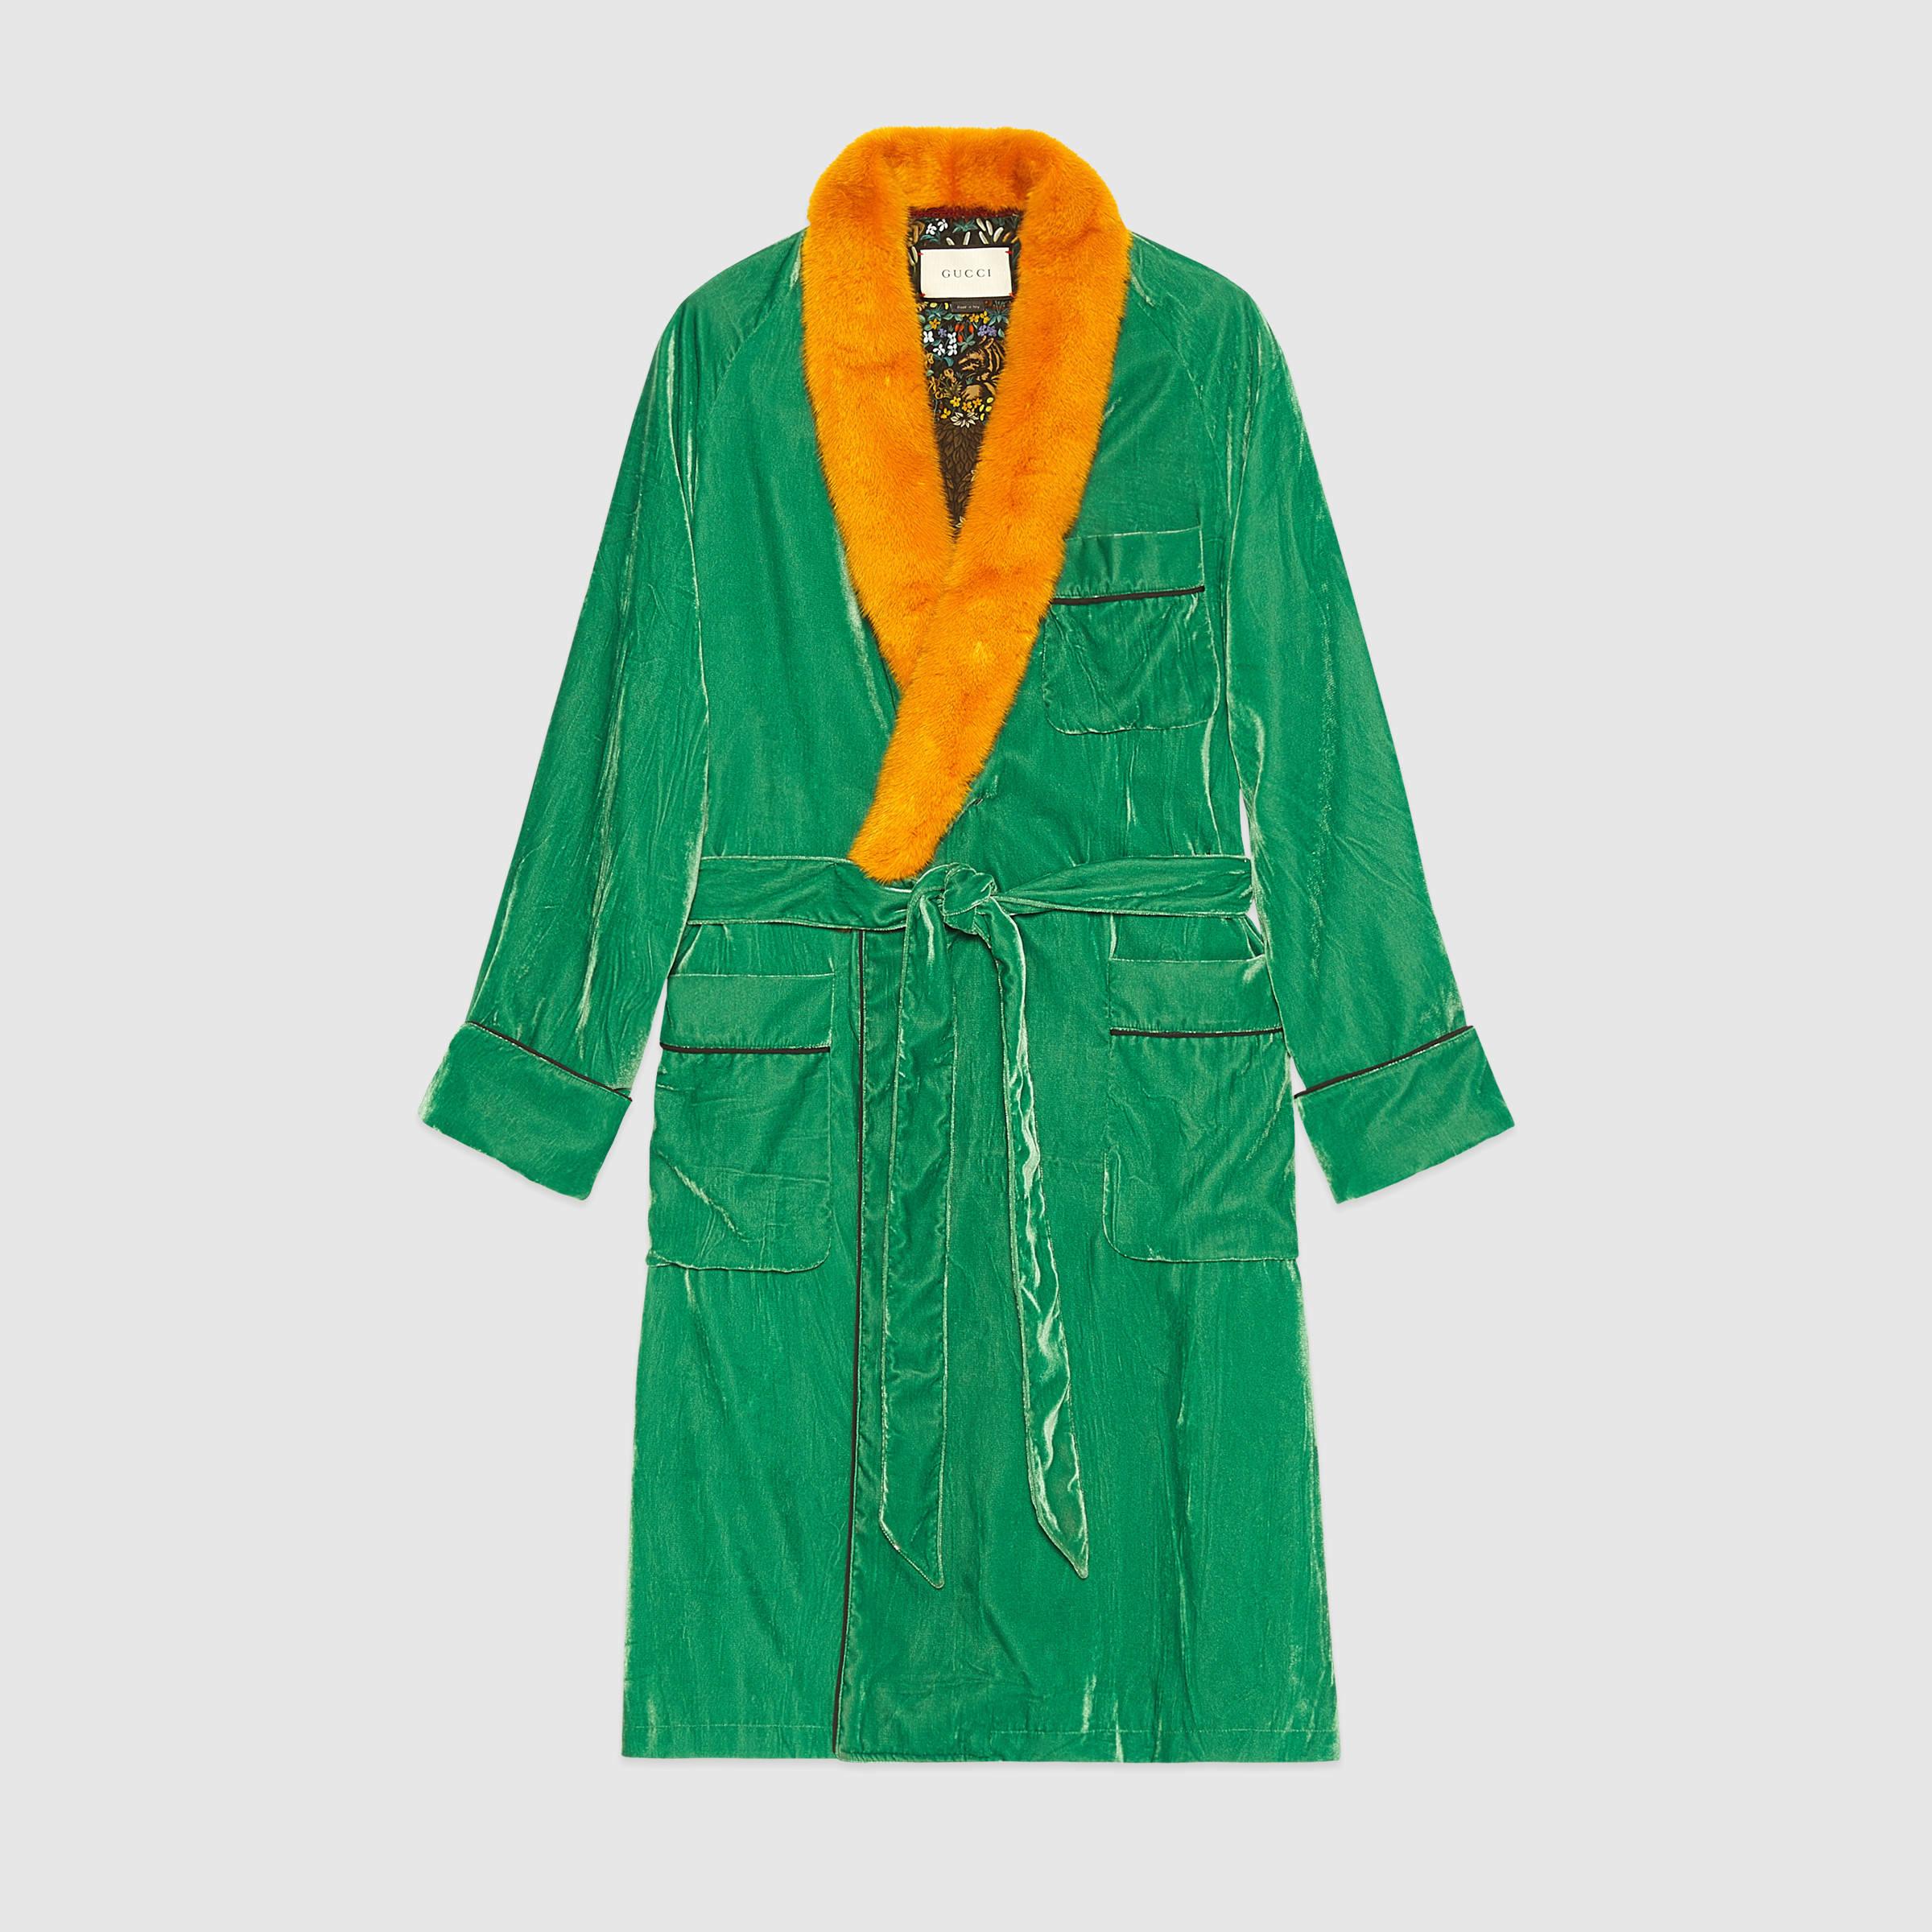 Lyst - Gucci Embroidered Velvet Dressing Gown for Men